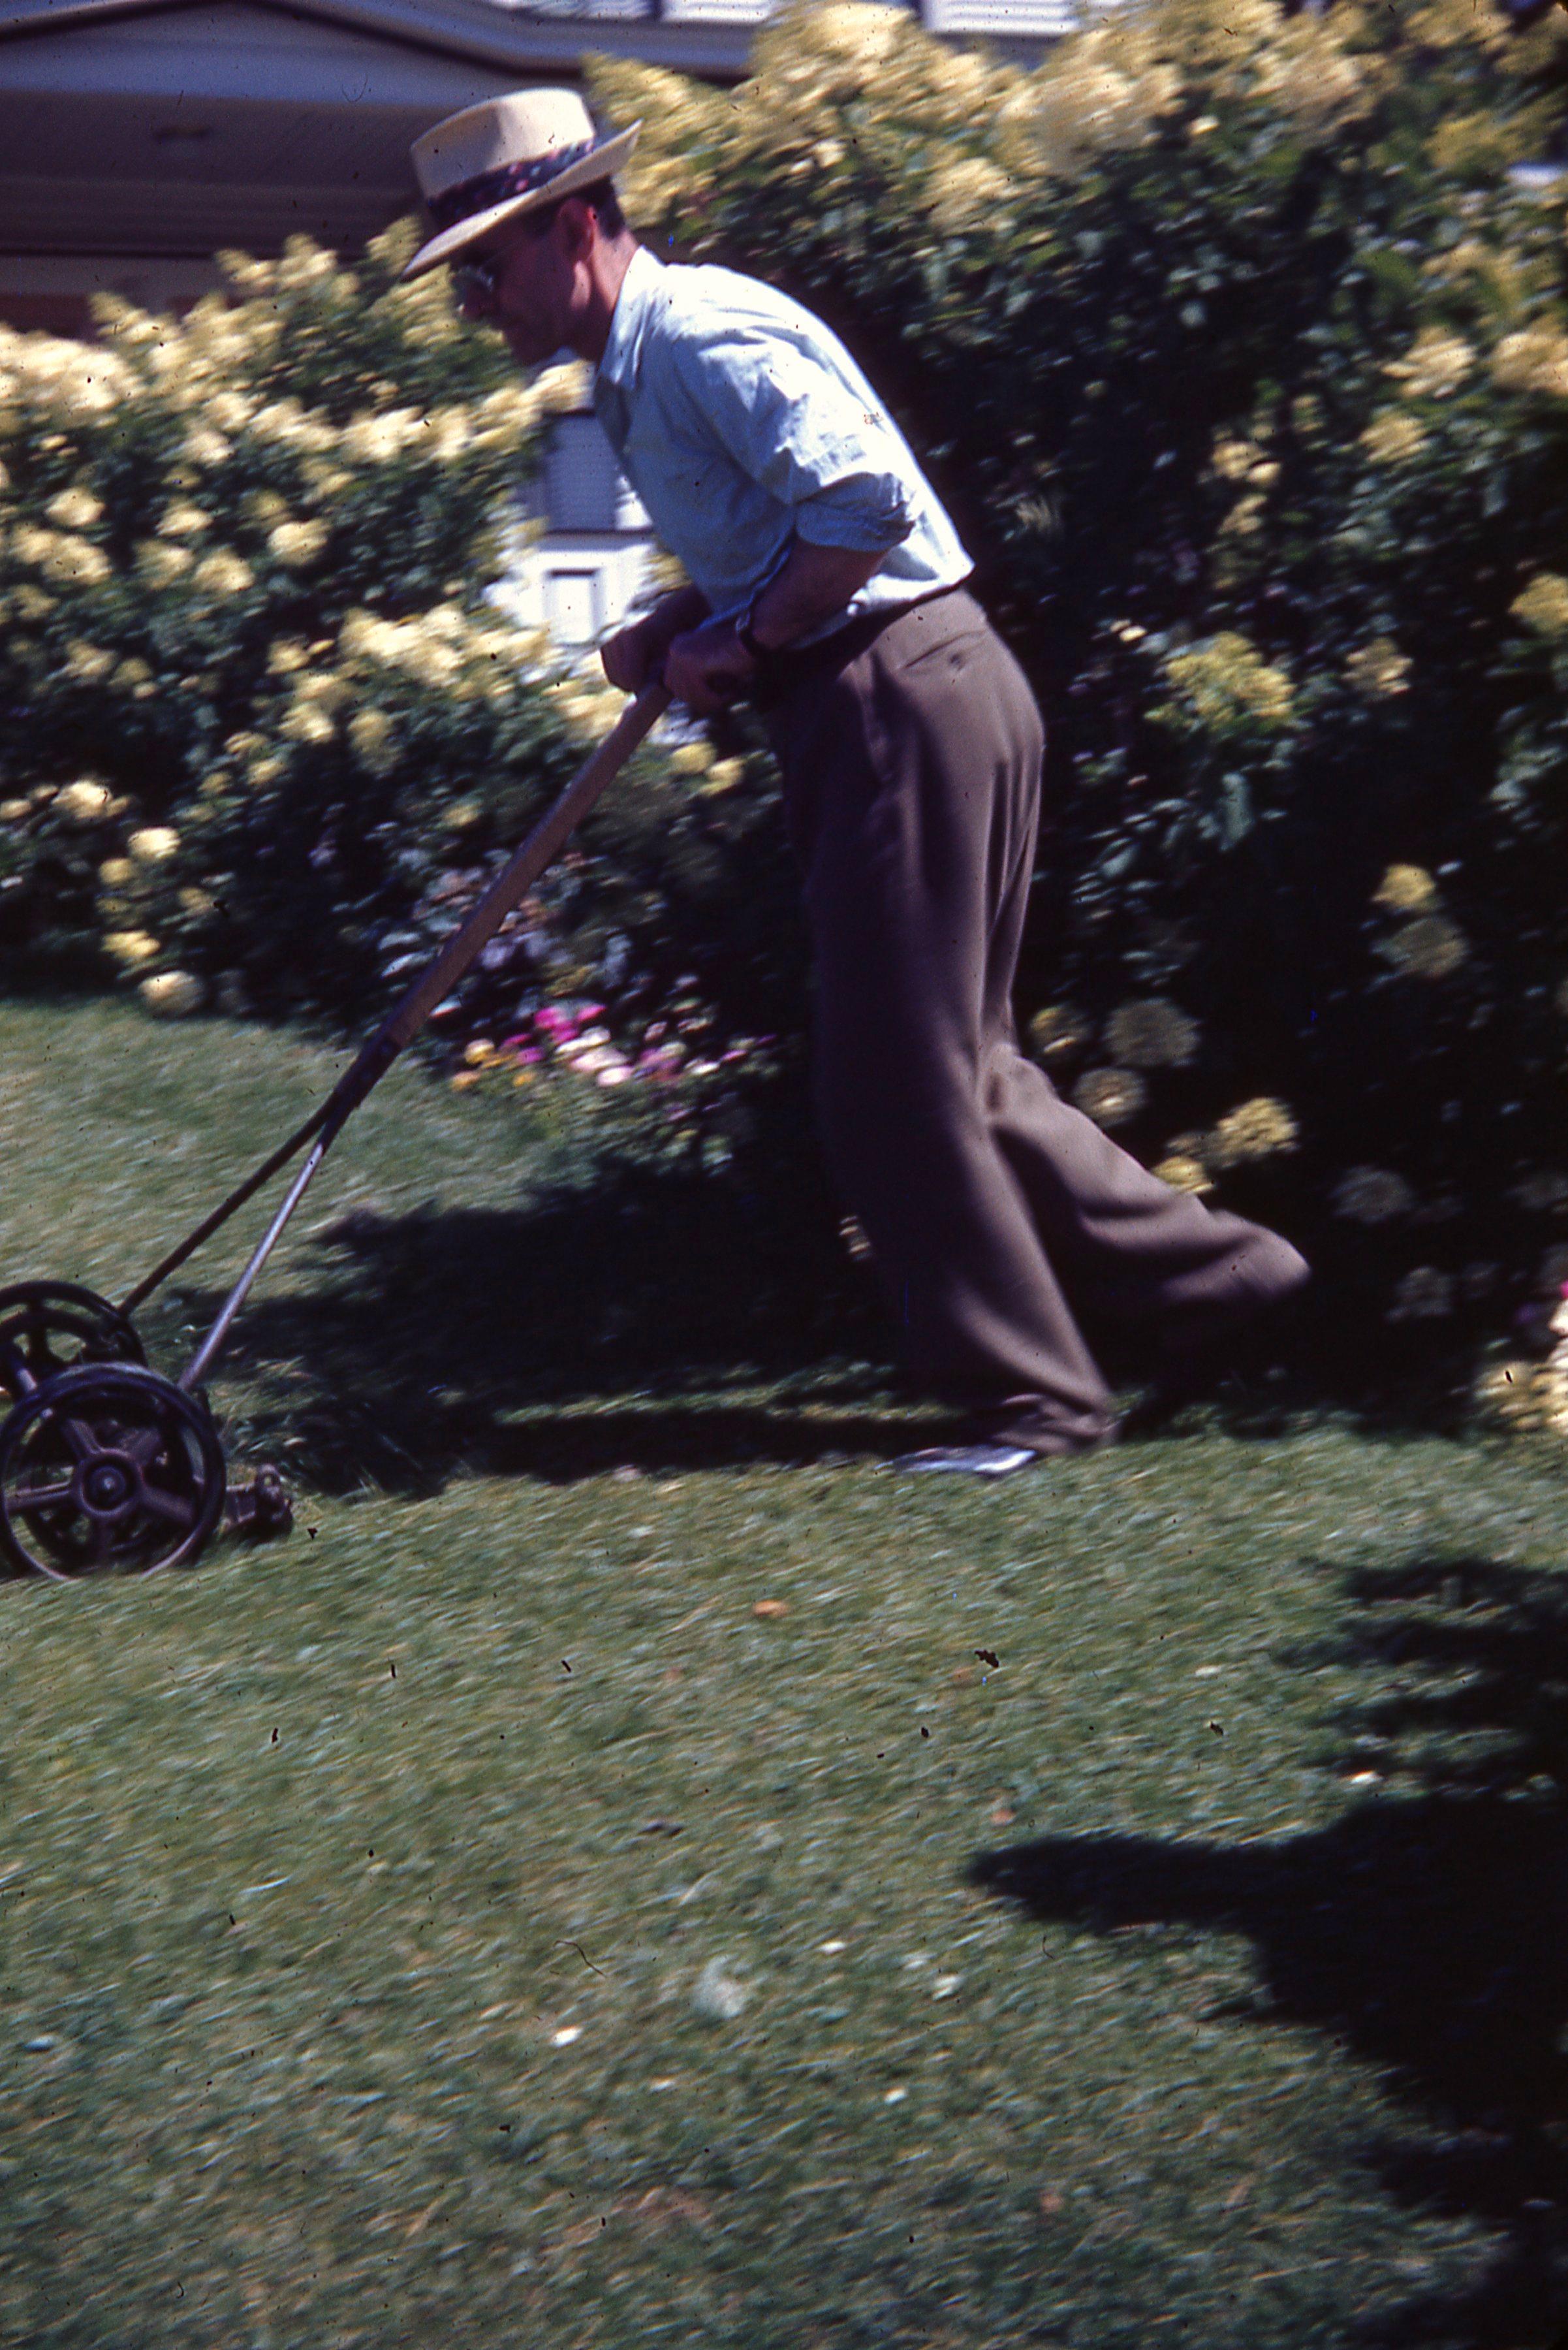 """Pop Mowing Lawn"" Kodachrome Photo Slide 1941-1949"